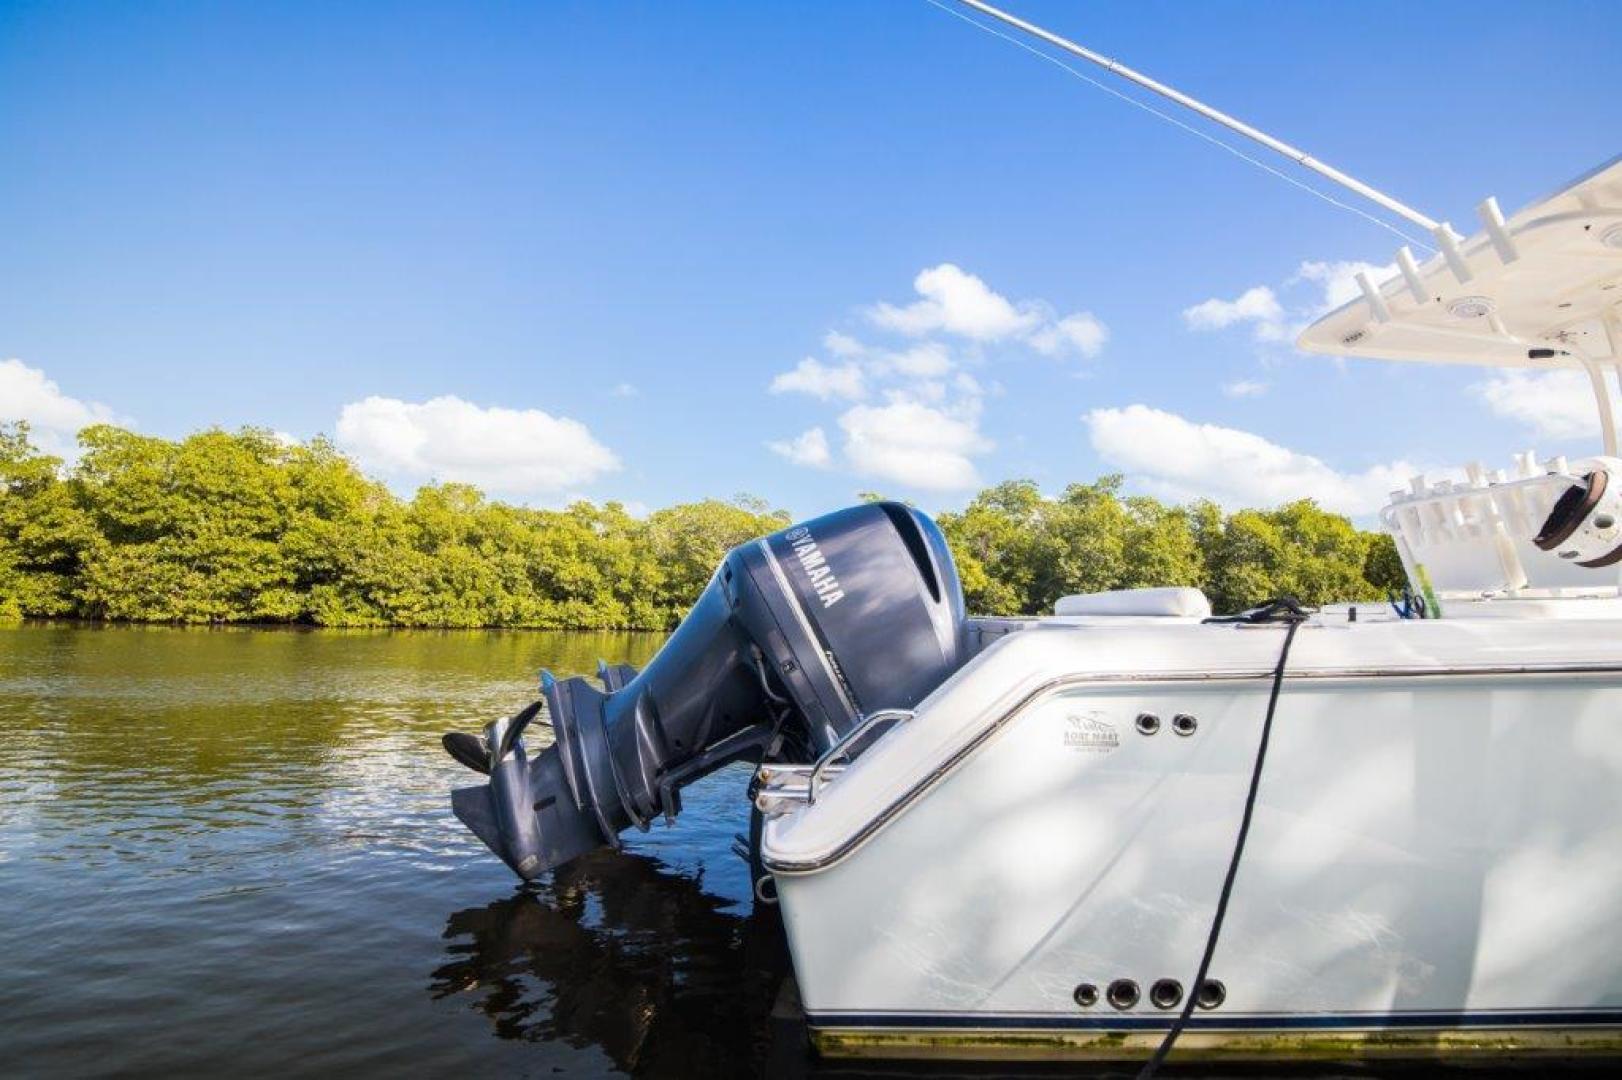 Sea Hunt-Gamefisherman 2013-No Name 29 Sea Hunt Key Largo-Florida-United States-Engines-1562275 | Thumbnail